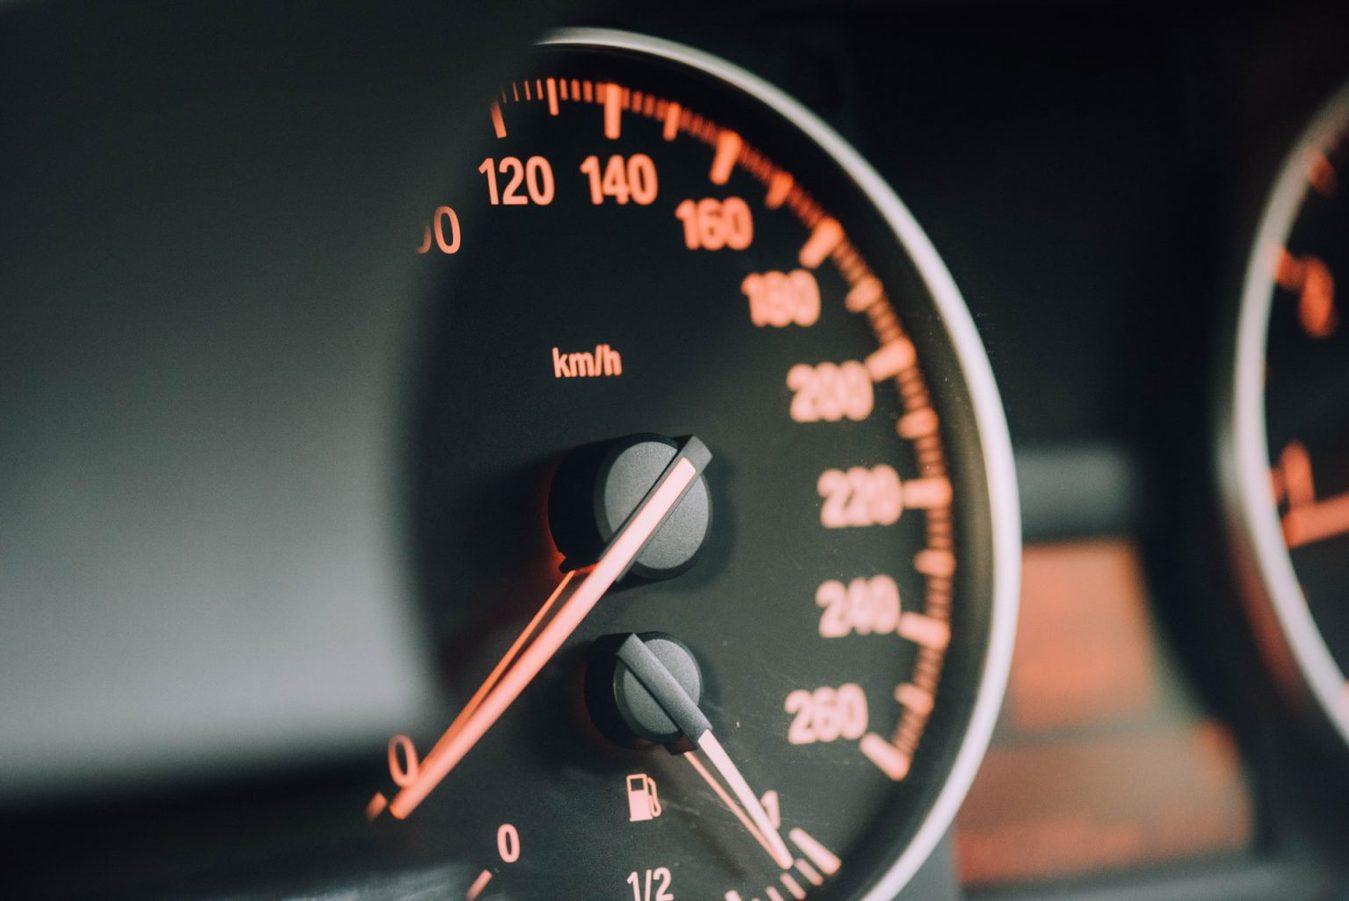 Snelheid auto oranje licht